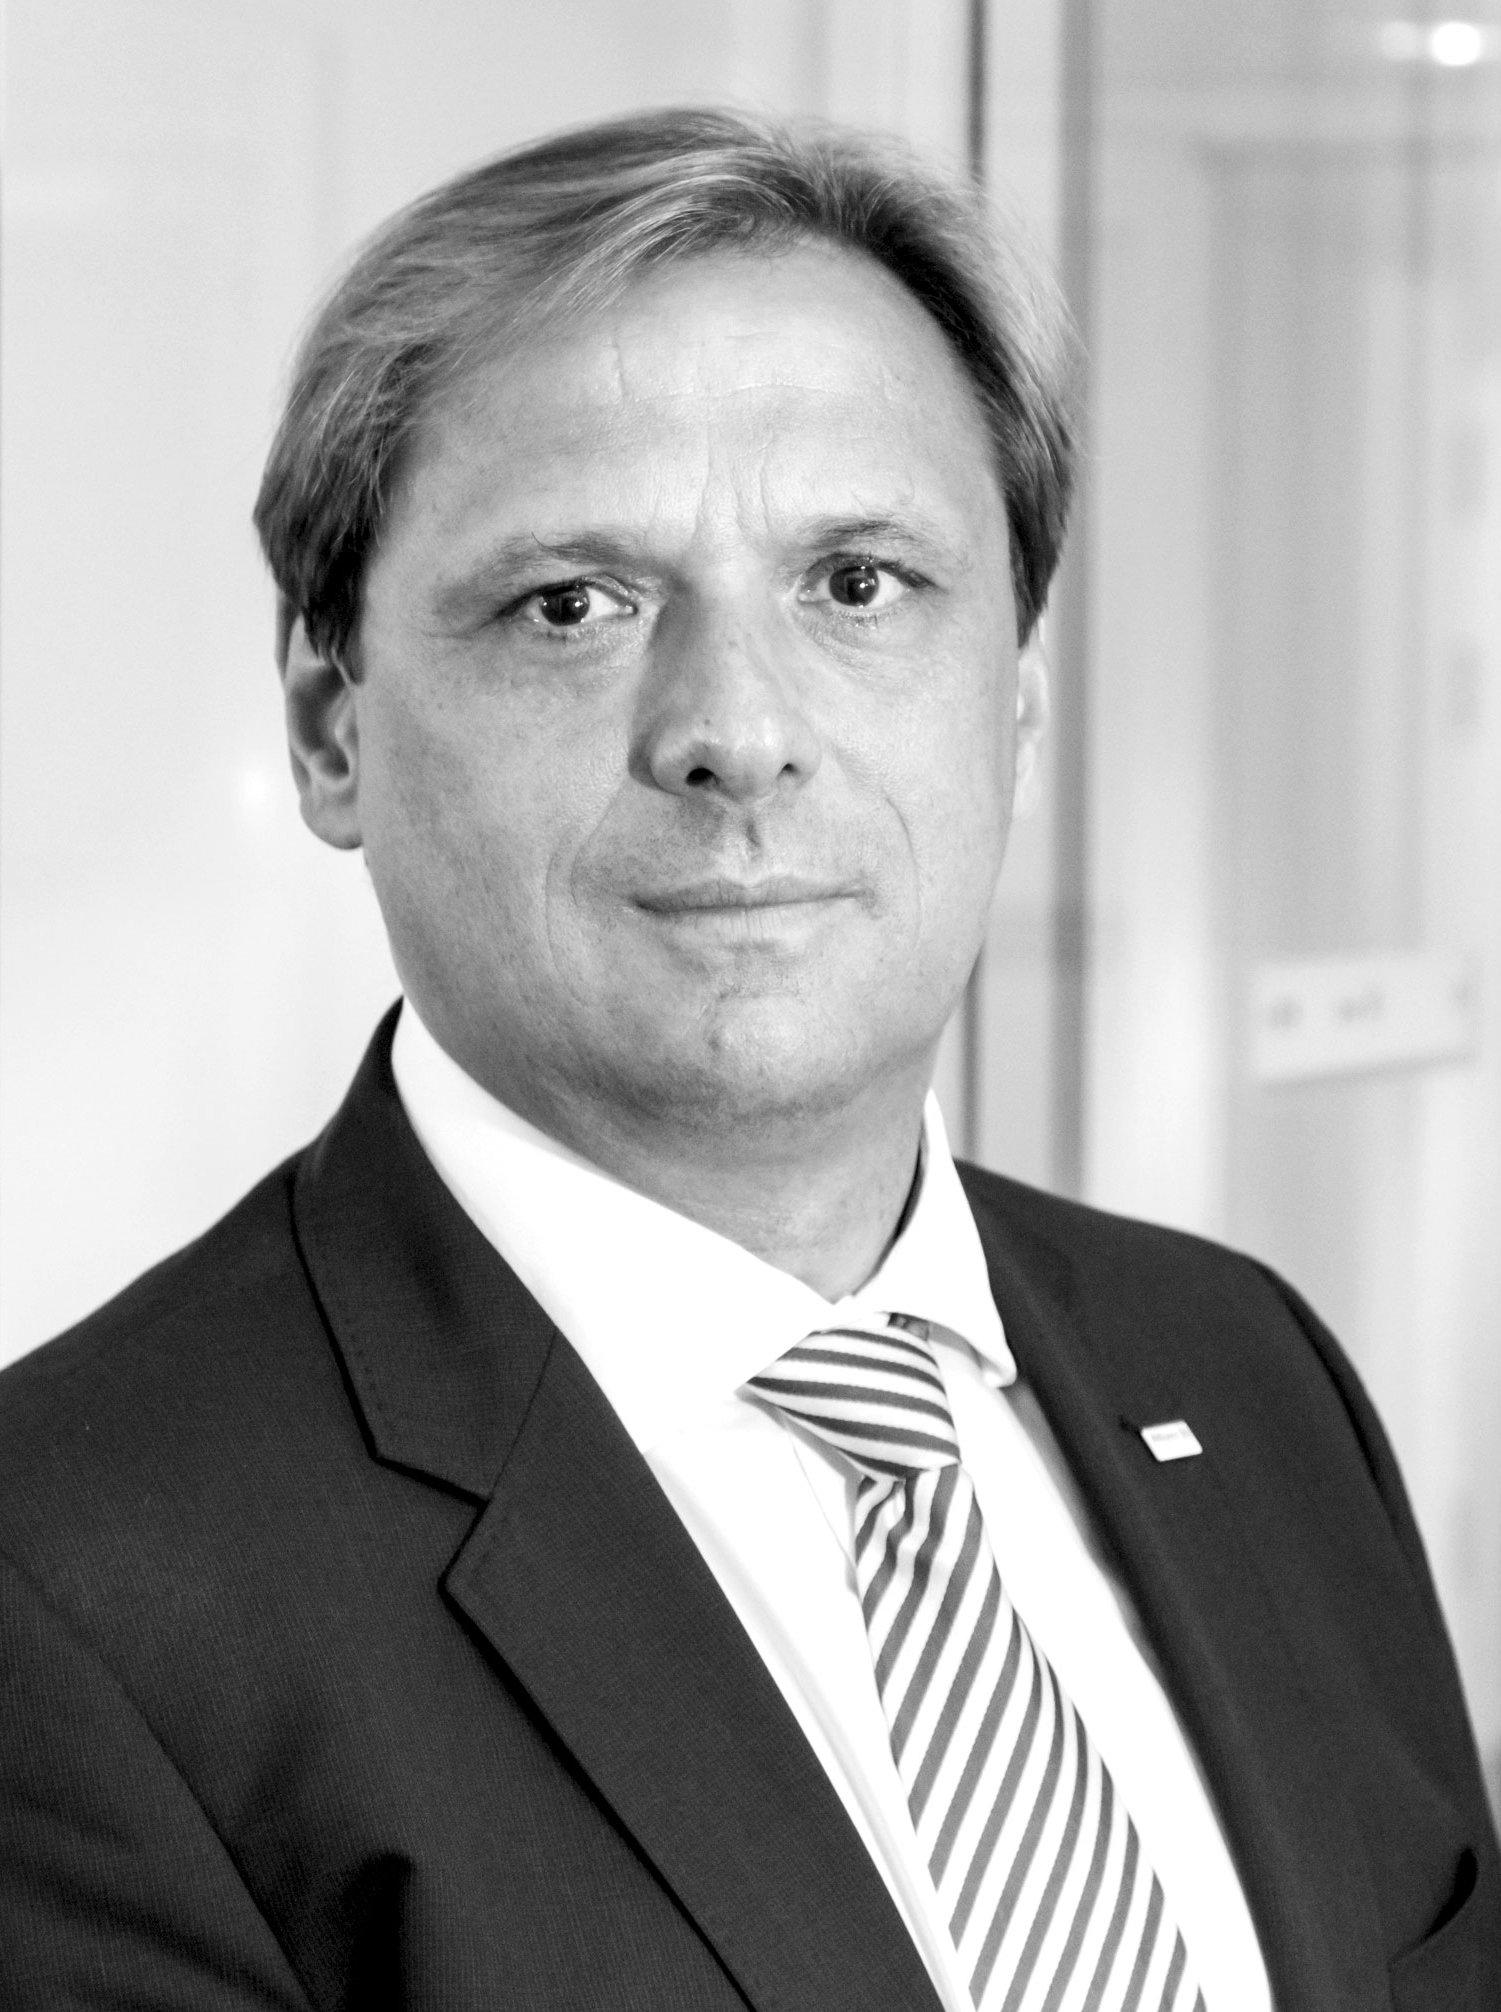 Martin Leissl